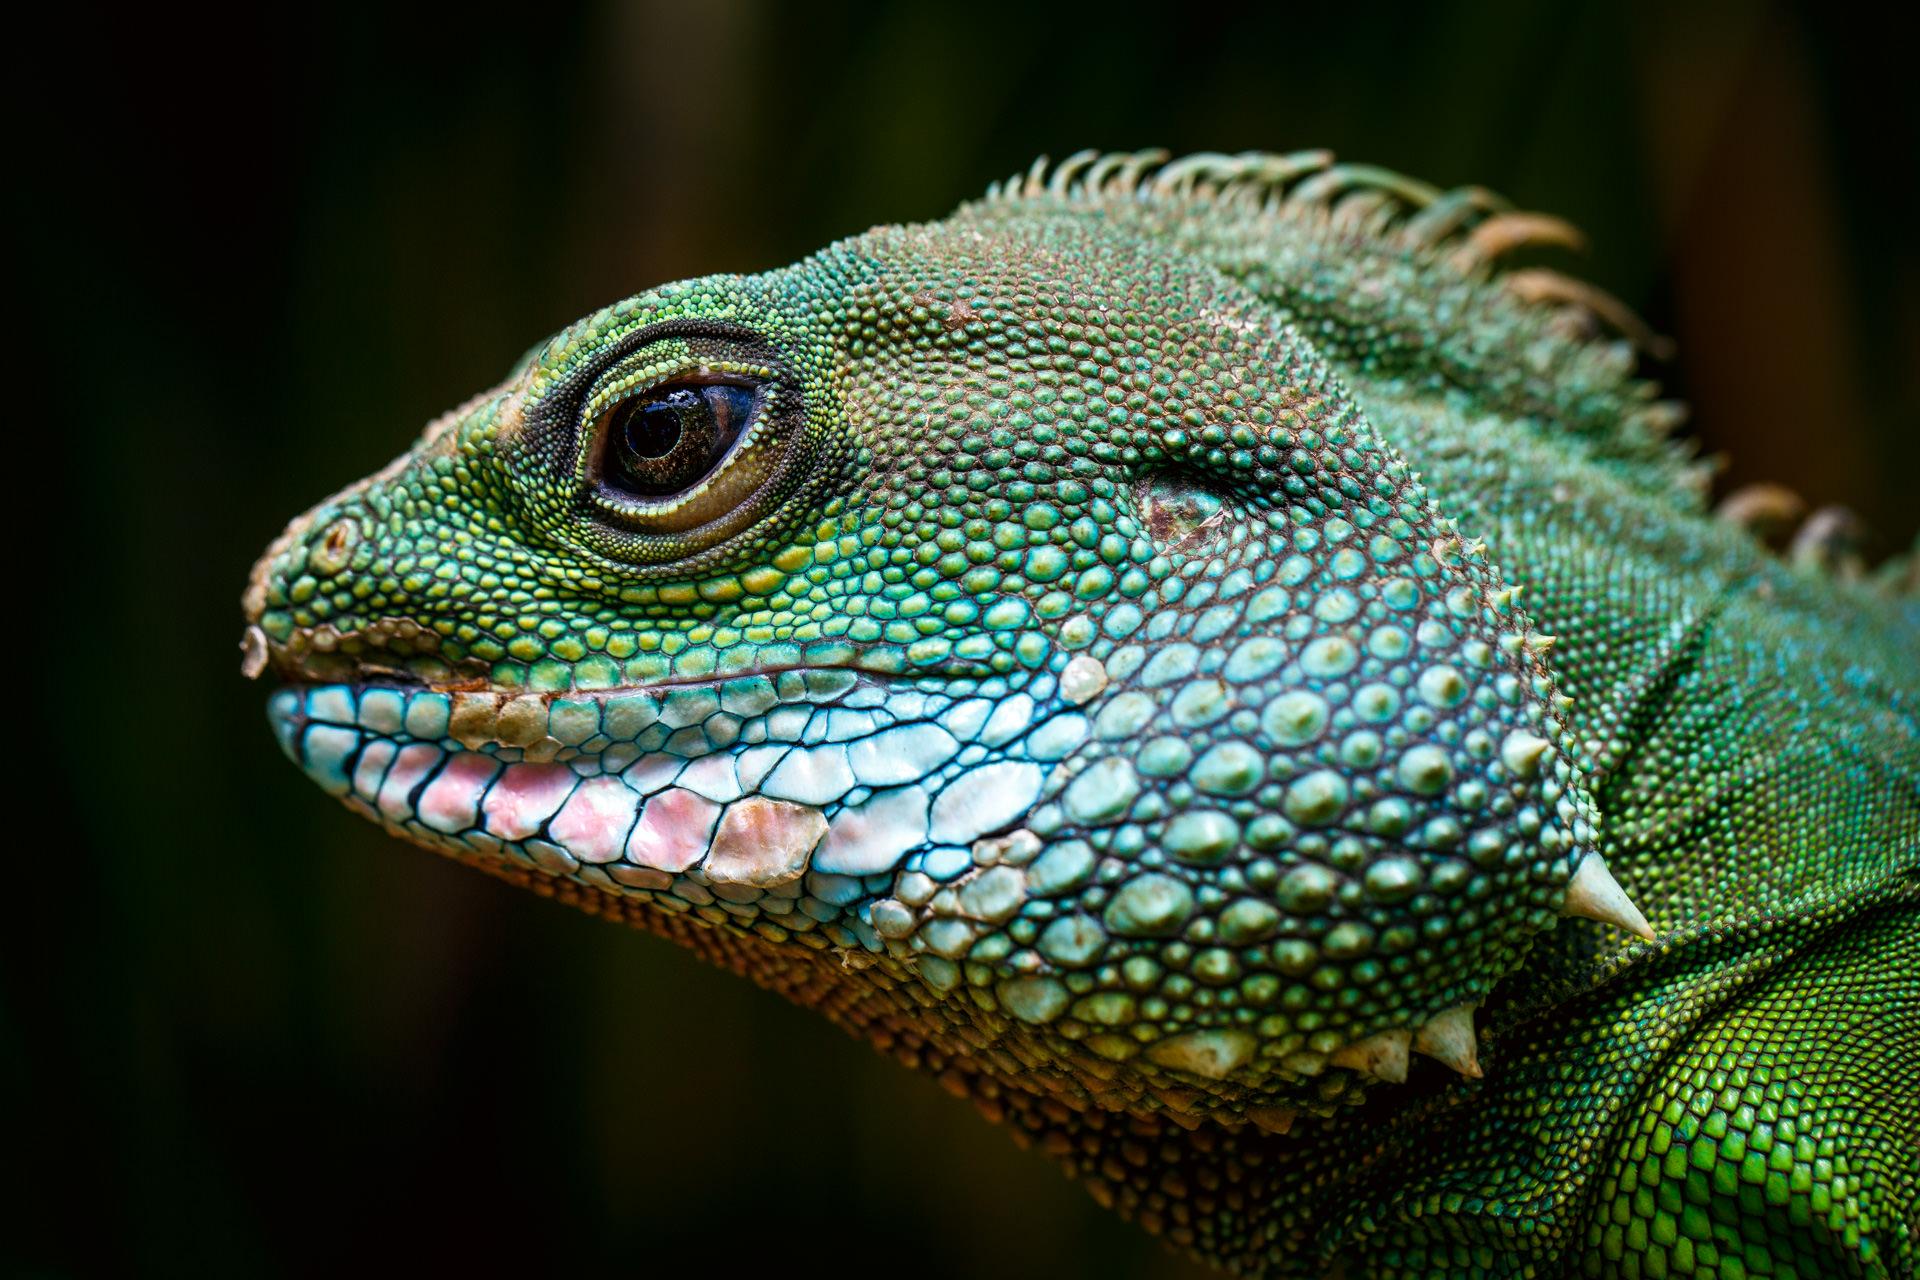 … and stumbled surprisingly across an iguana.